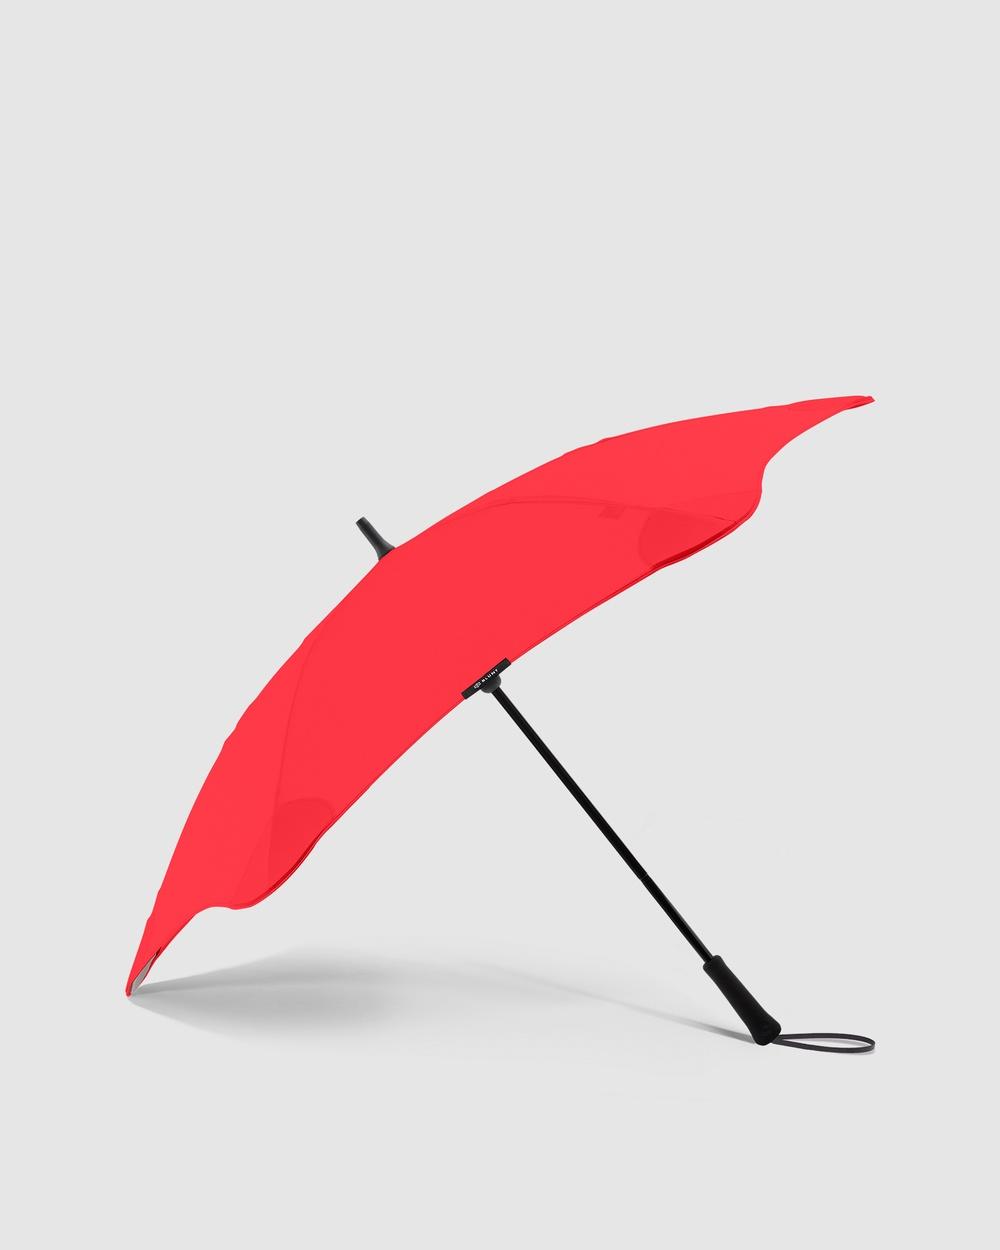 BLUNT Umbrellas Blunt Exec Umbrella Accessories Red